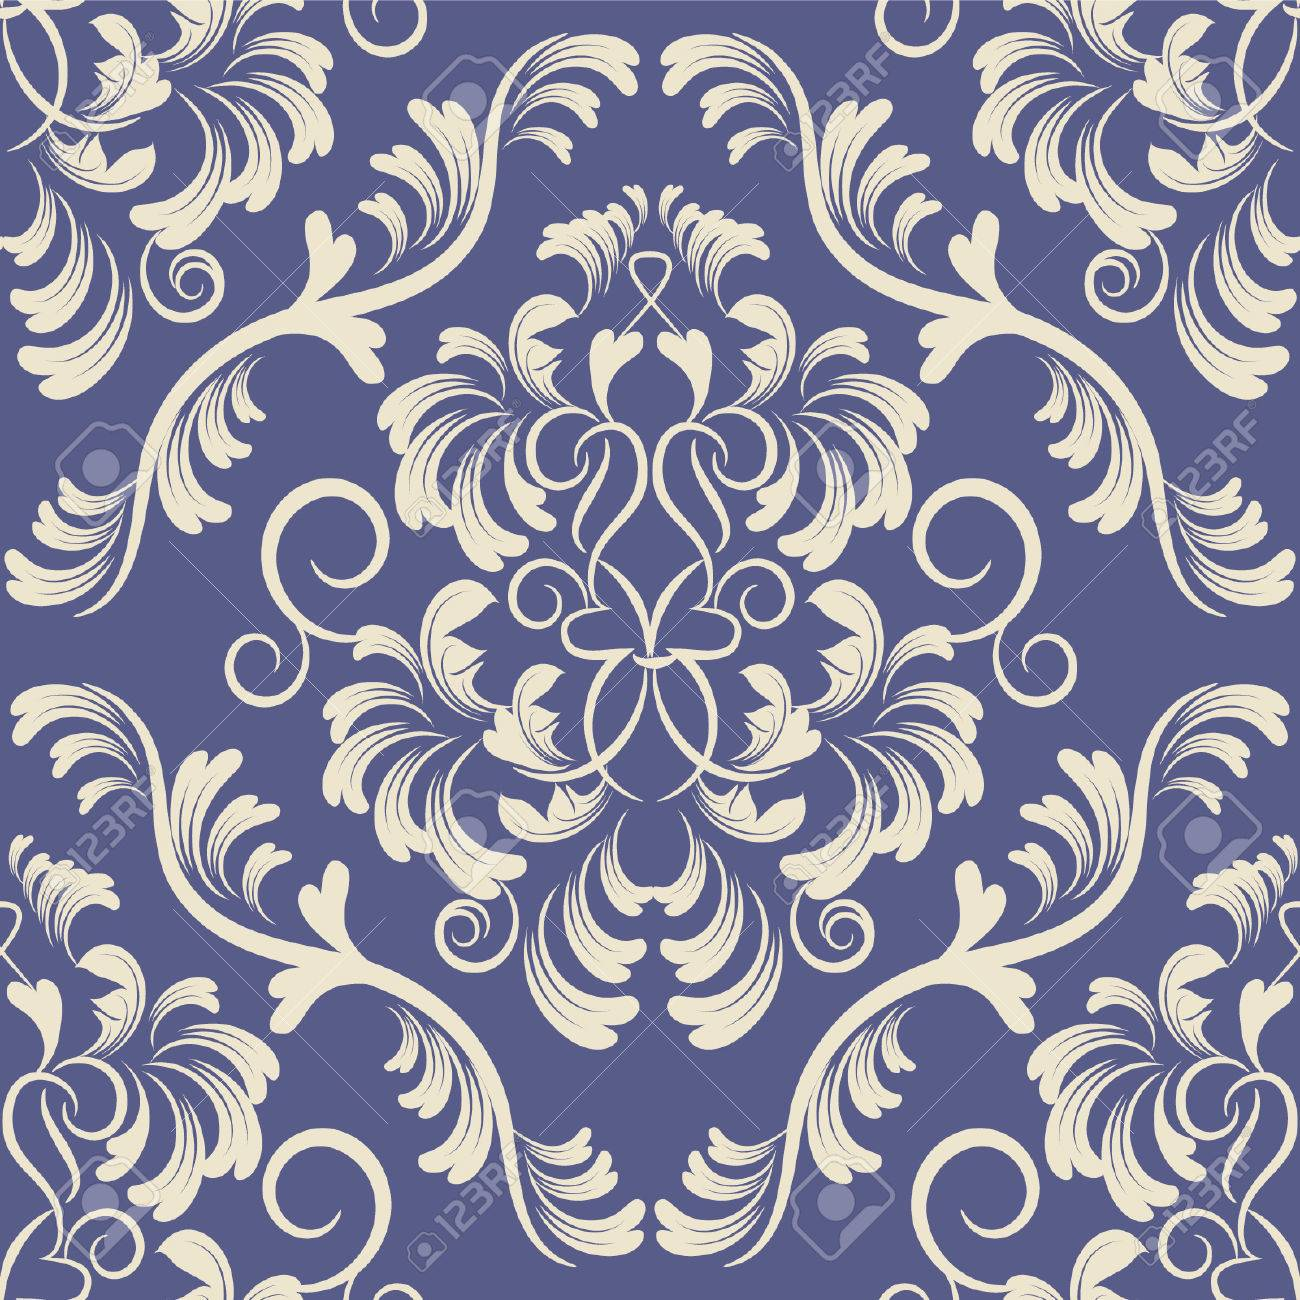 flower seamless background damask pattern floral wallpaper - 27930813